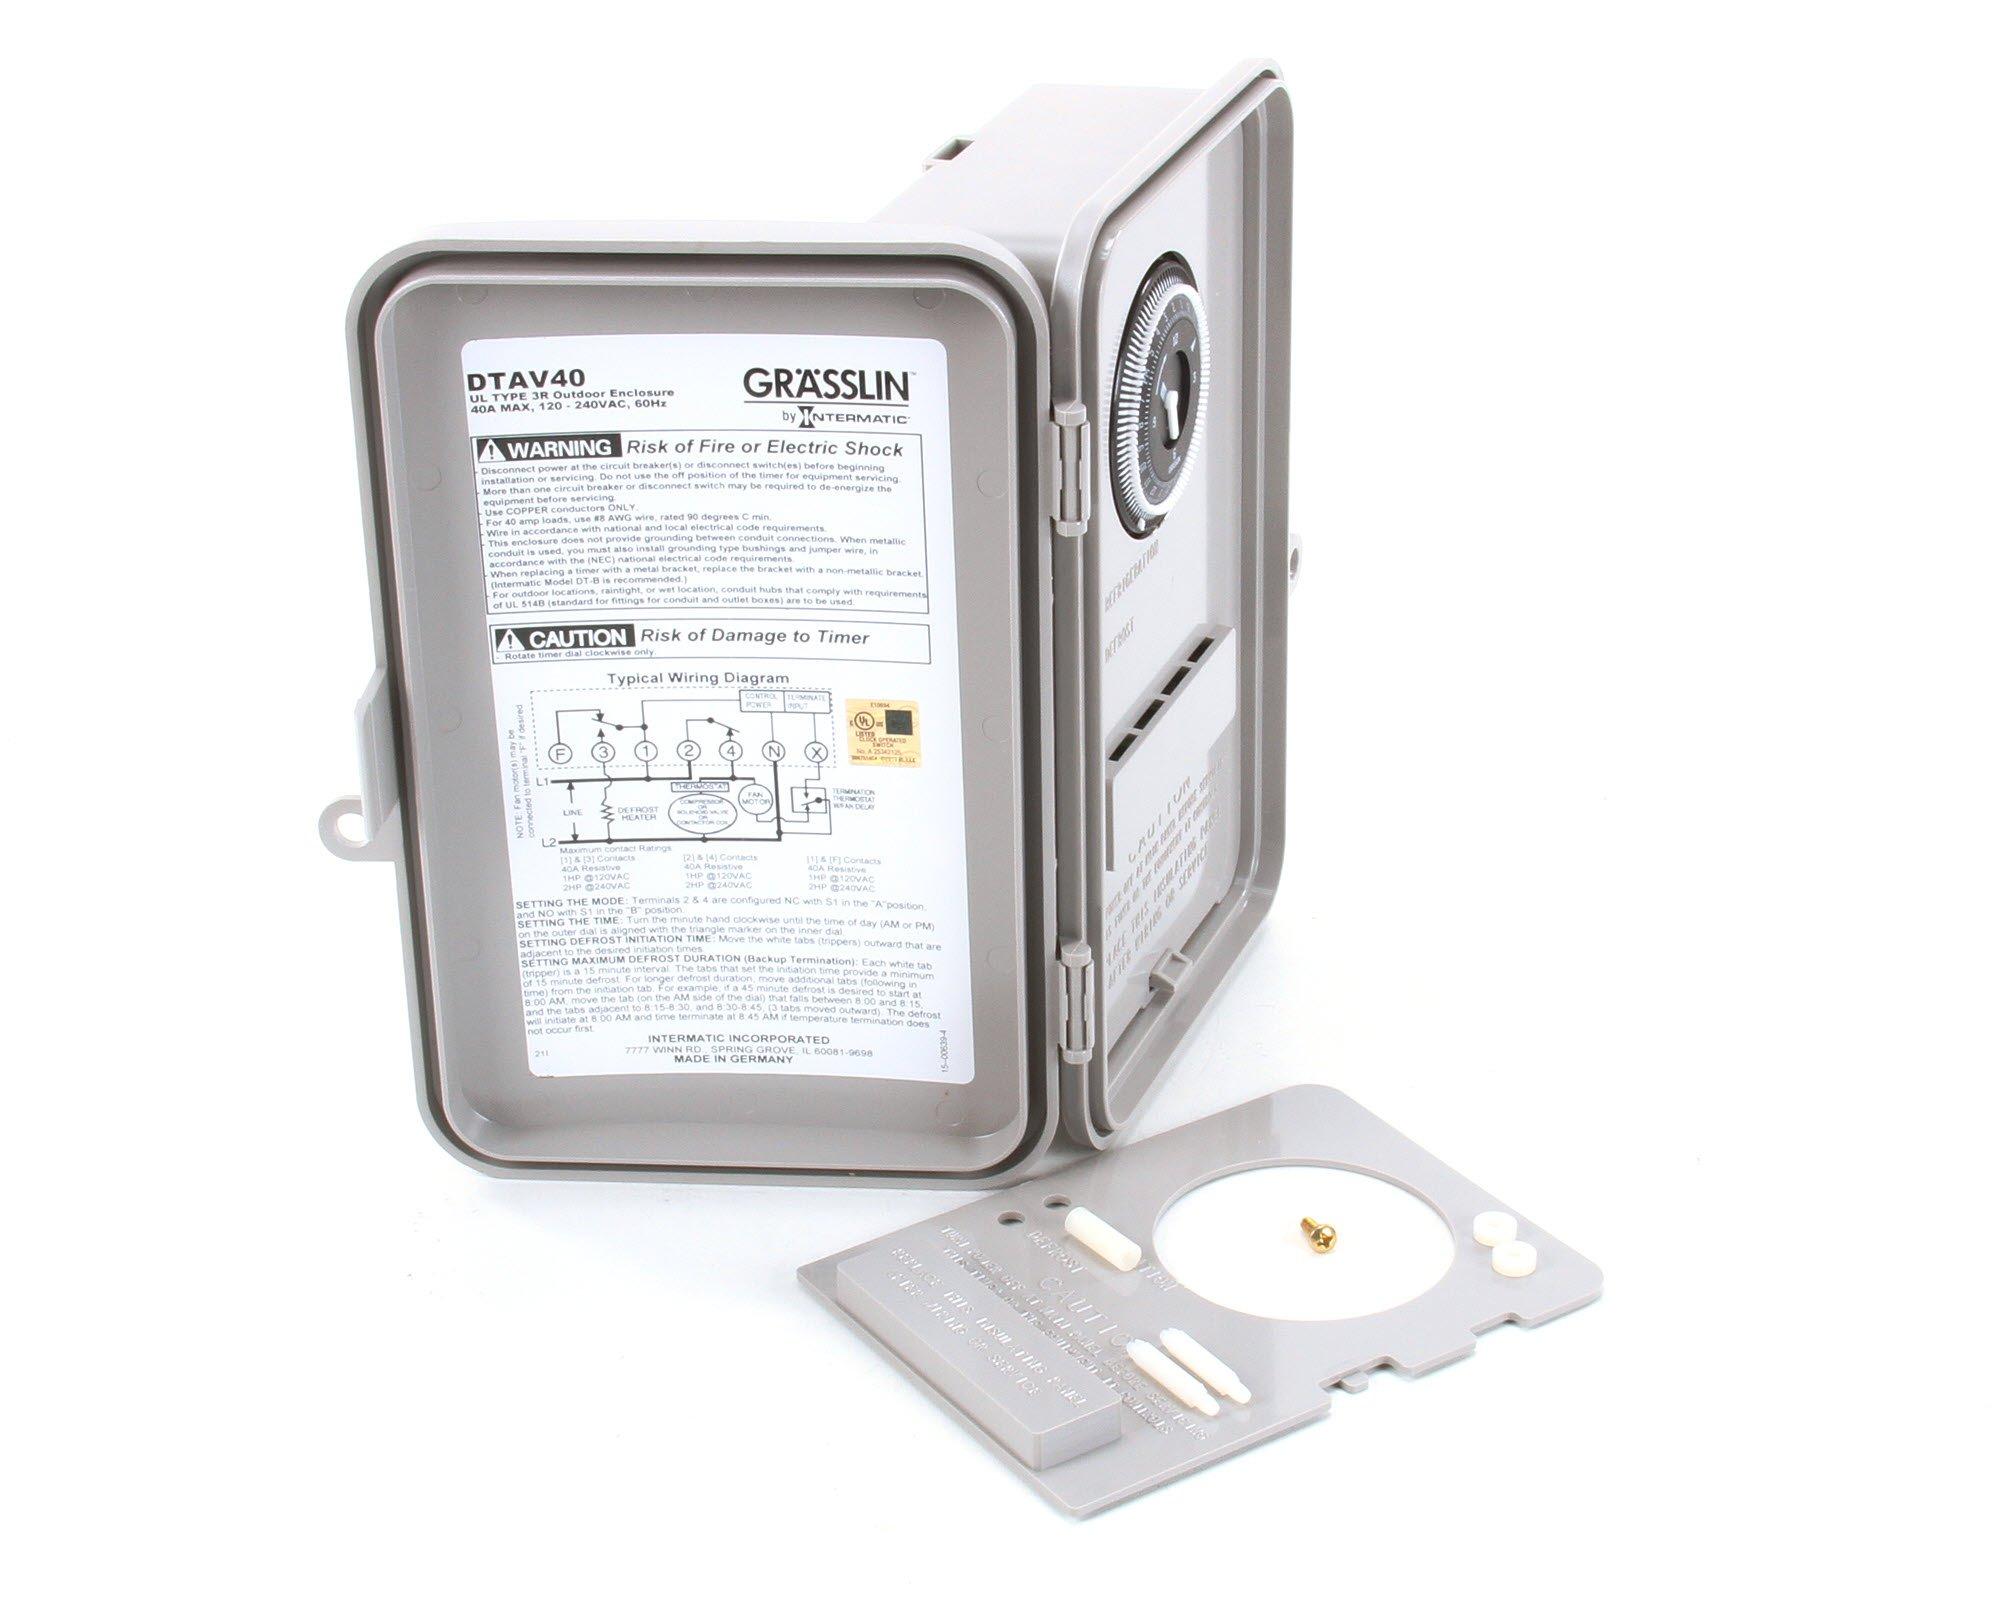 Grasslin DTAV40, Universal Defrost Timer by Grasslin